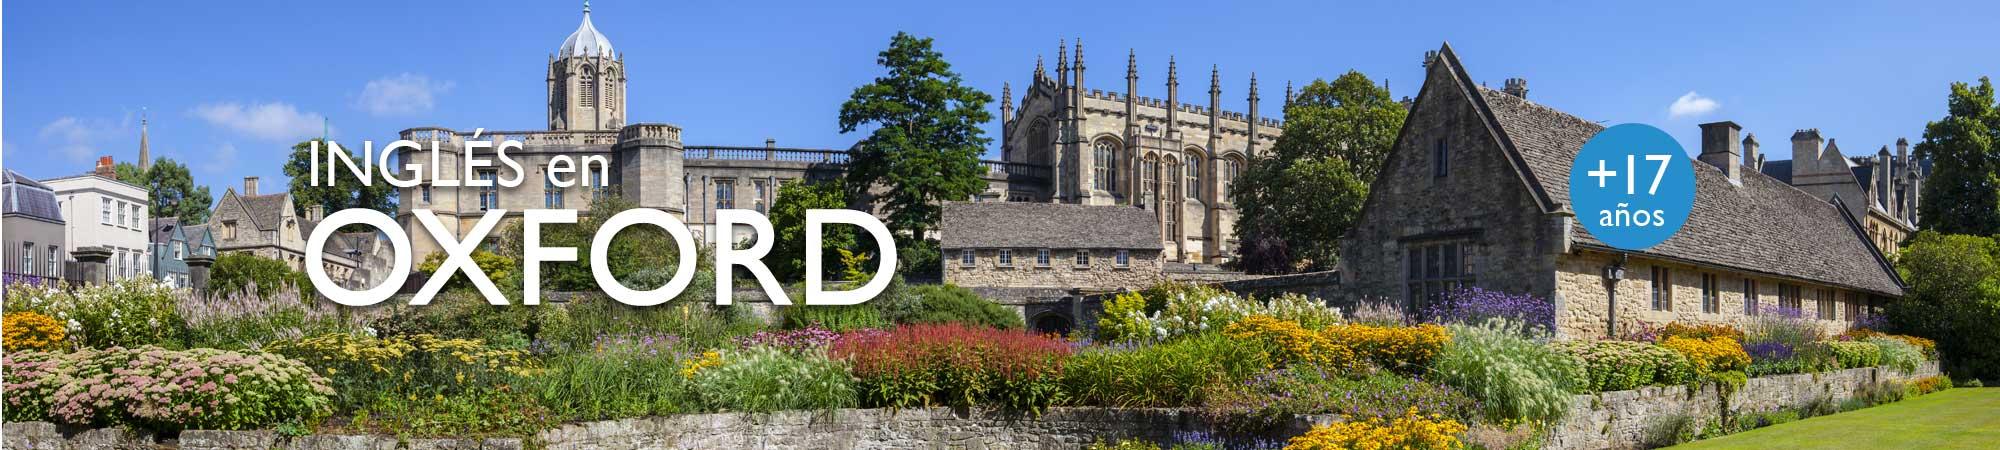 Estudiar ingles en Oxford Inglaterra Midleton School